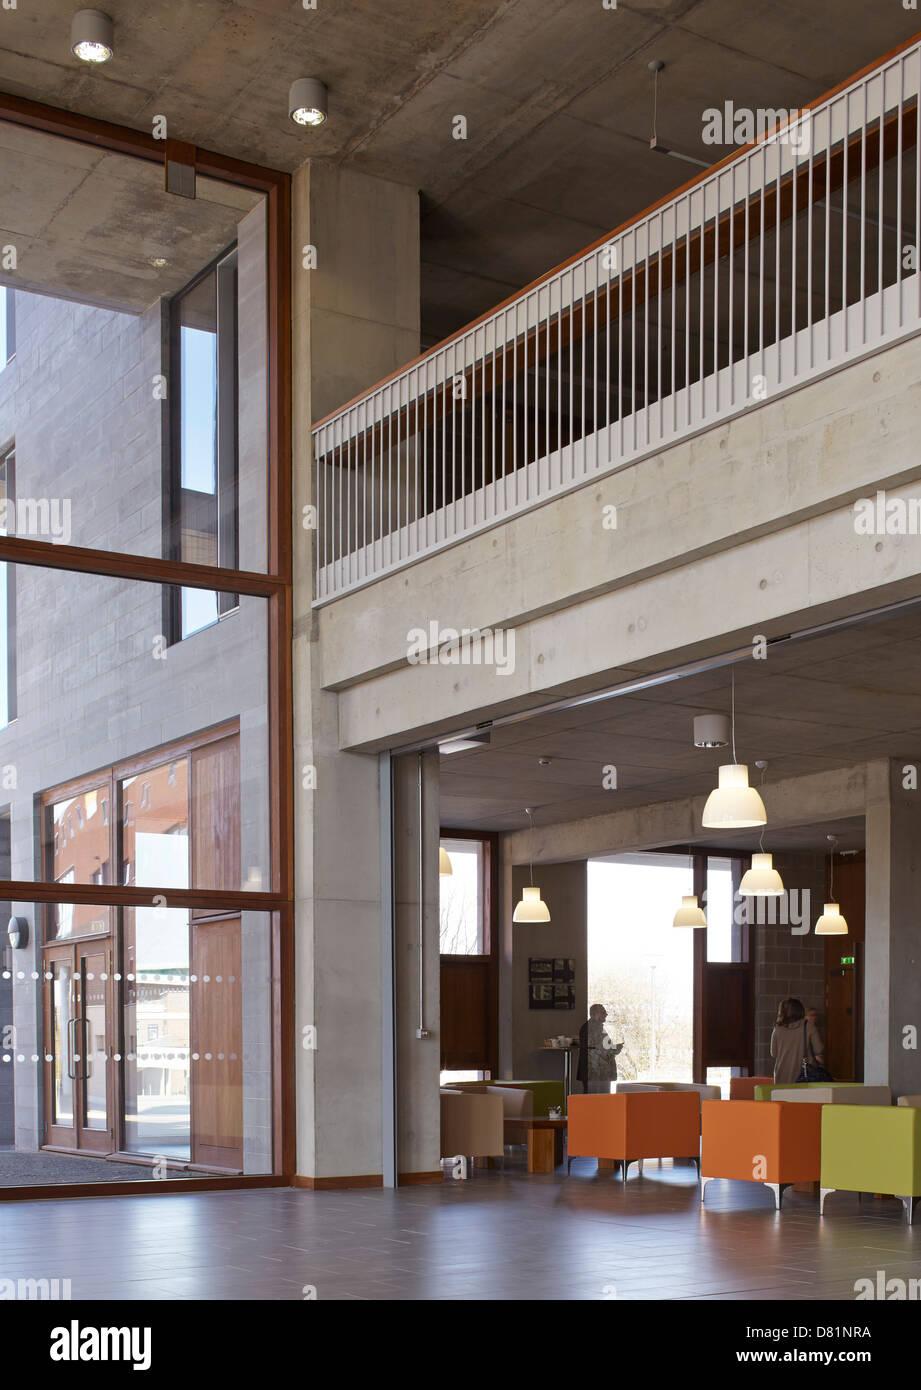 Medical School Building And Student Accommodation University Limerick Ireland Architect Grafton Architects 2012 D